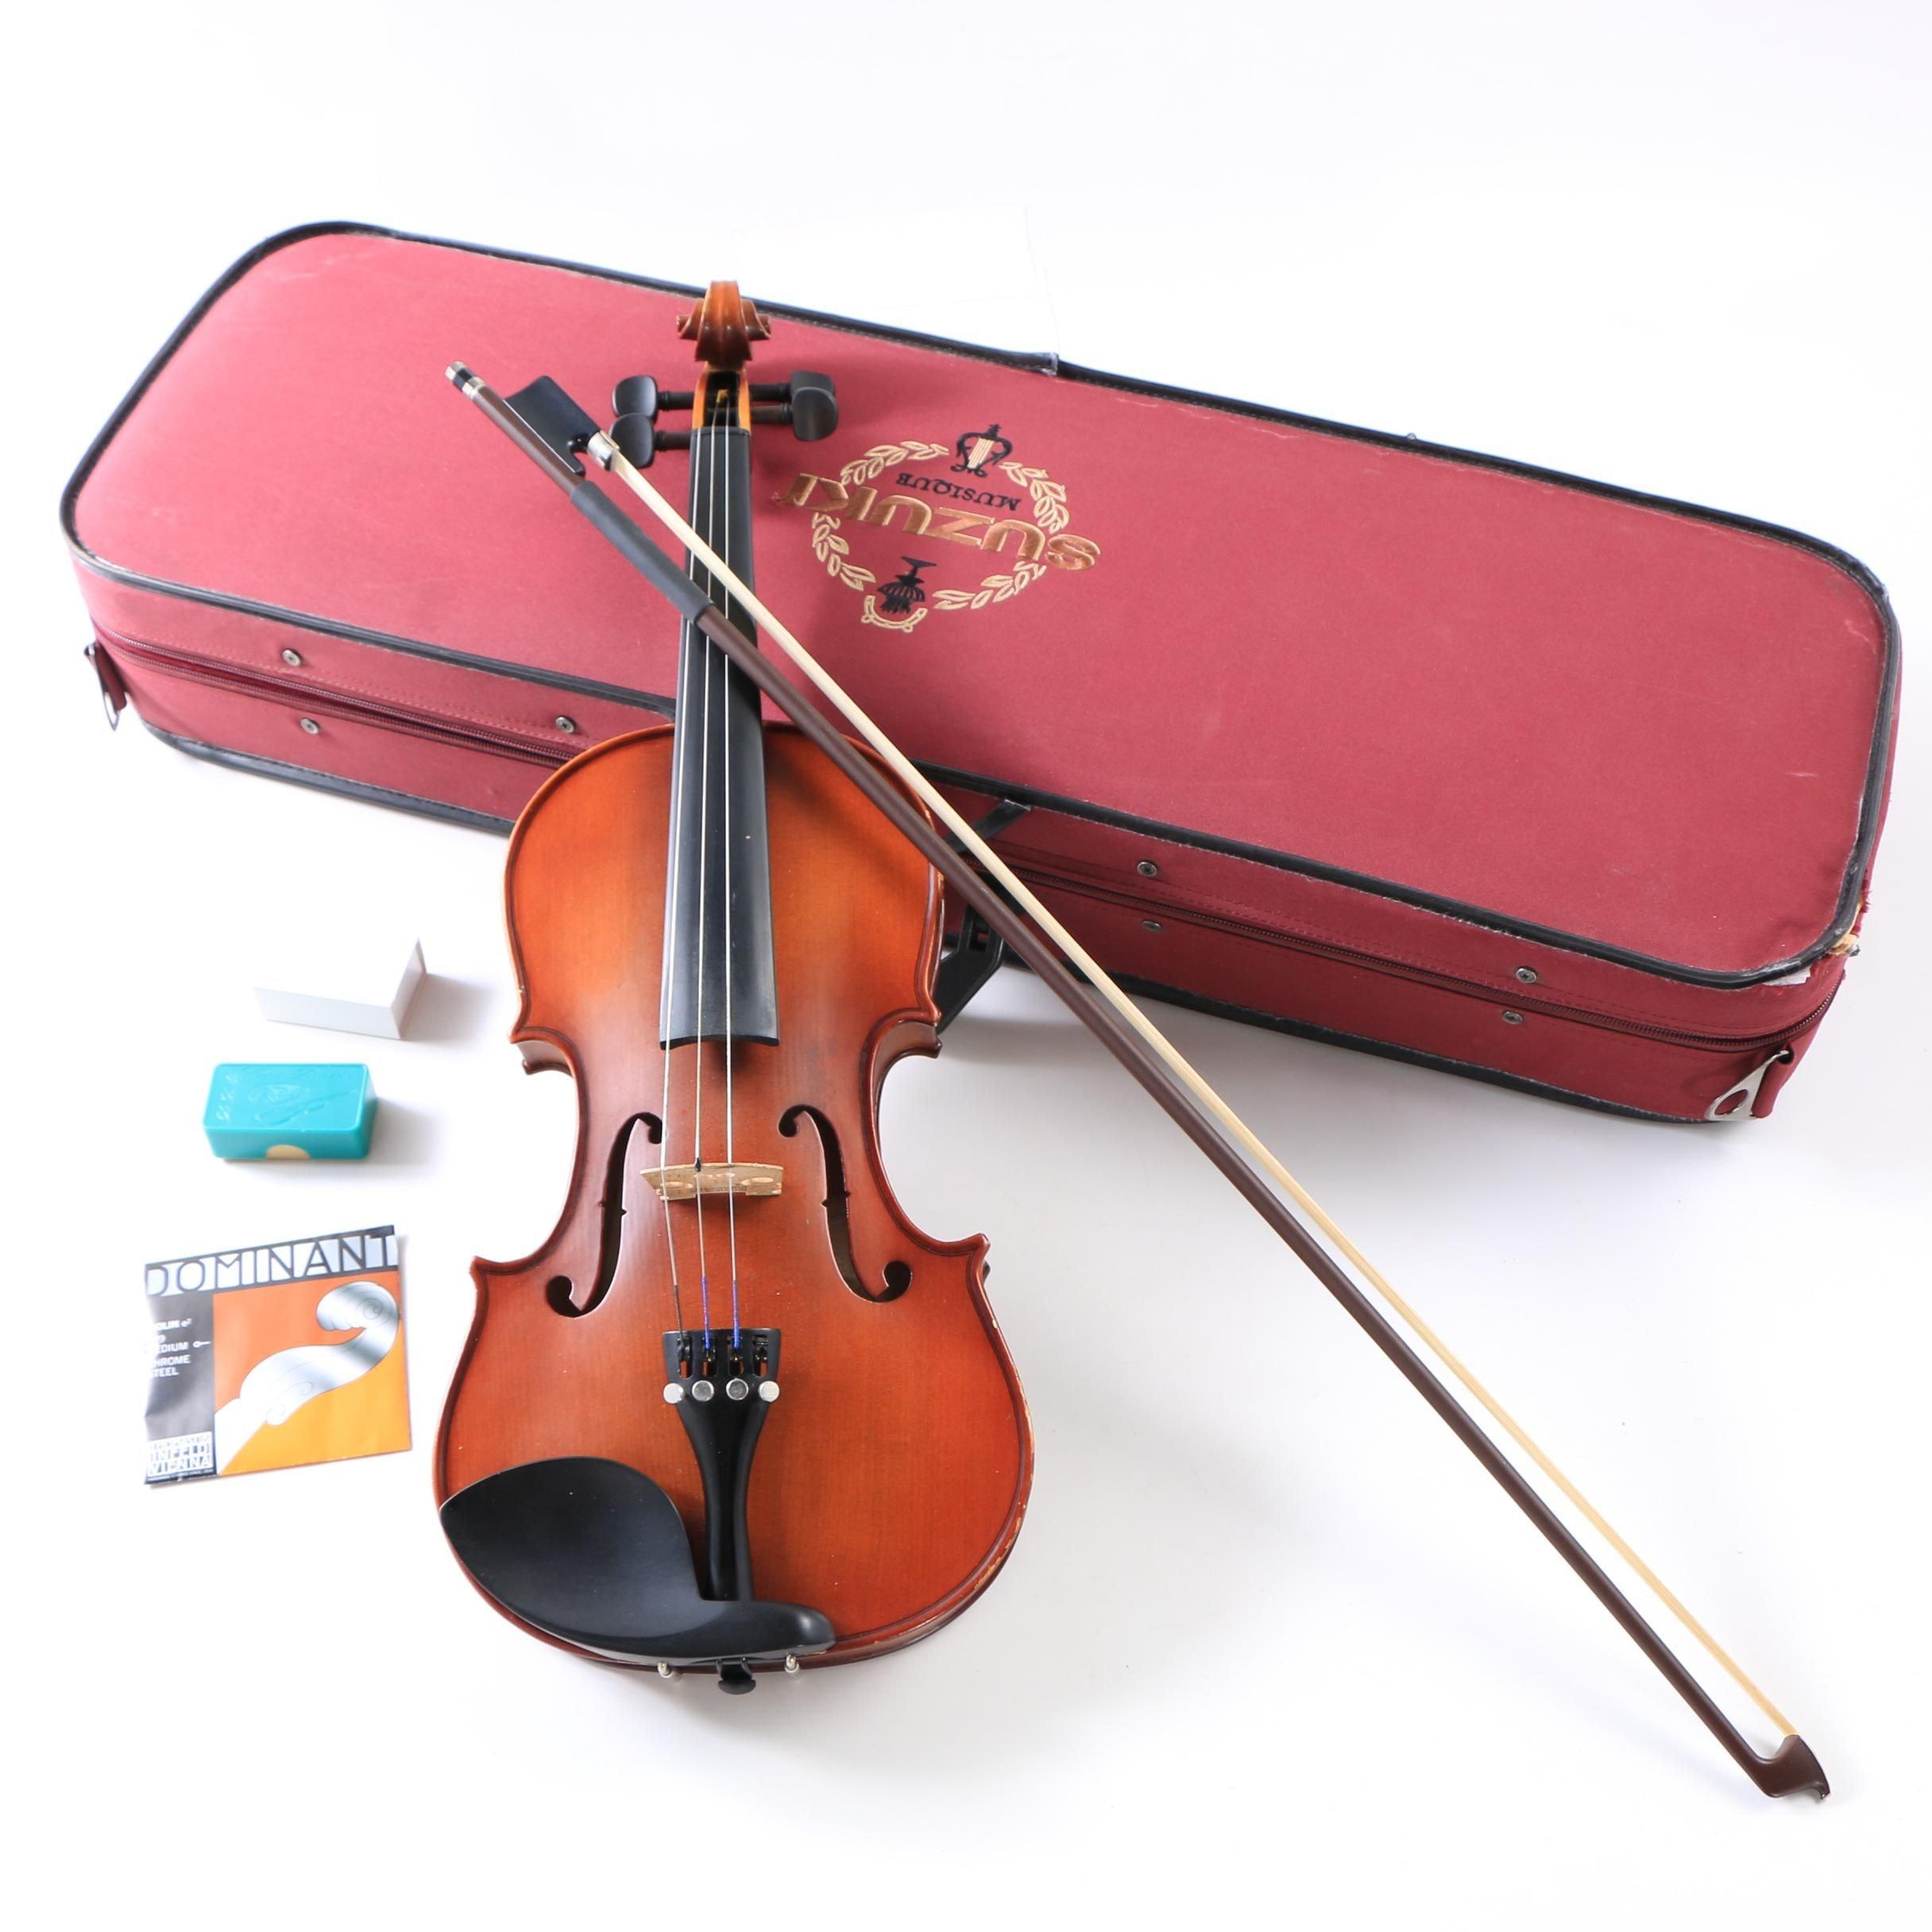 Suzuki Musique 4/4 Student Violin